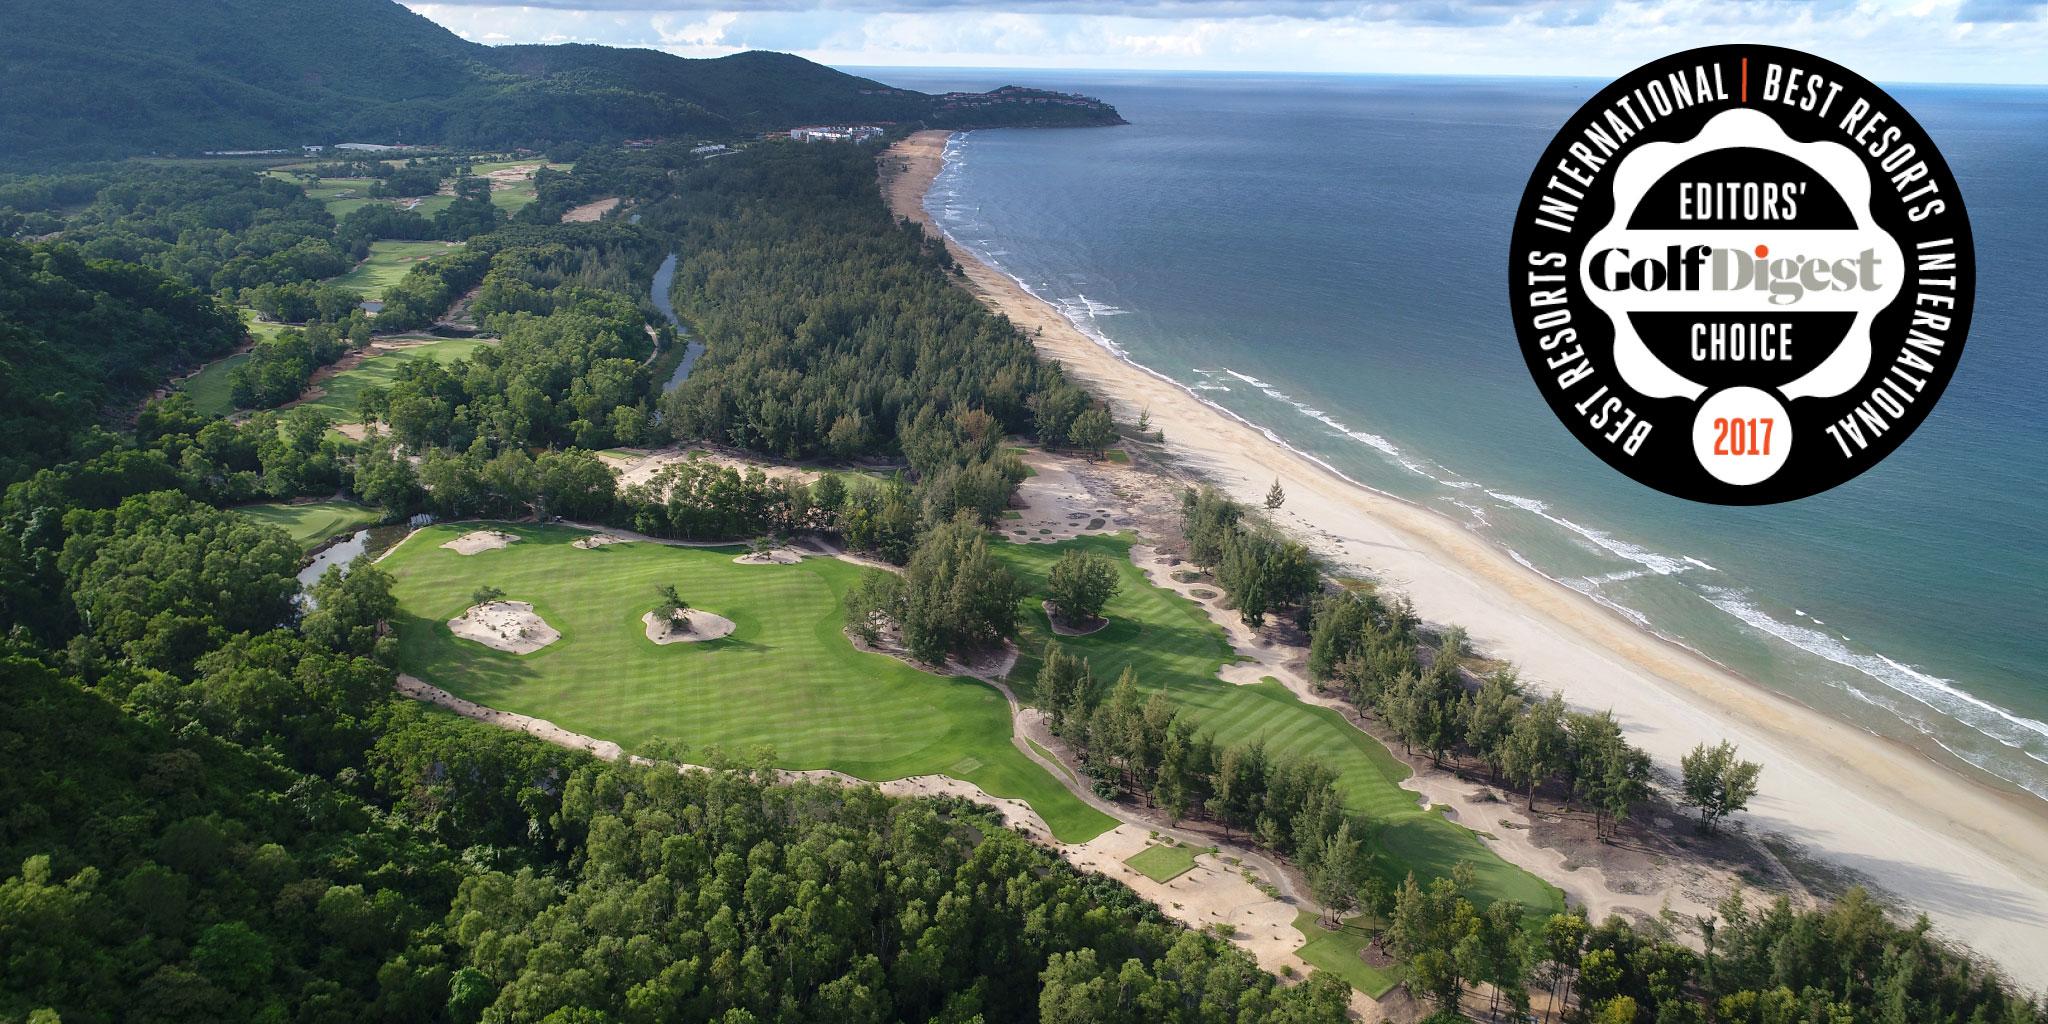 Best Golf Resort International – Asia